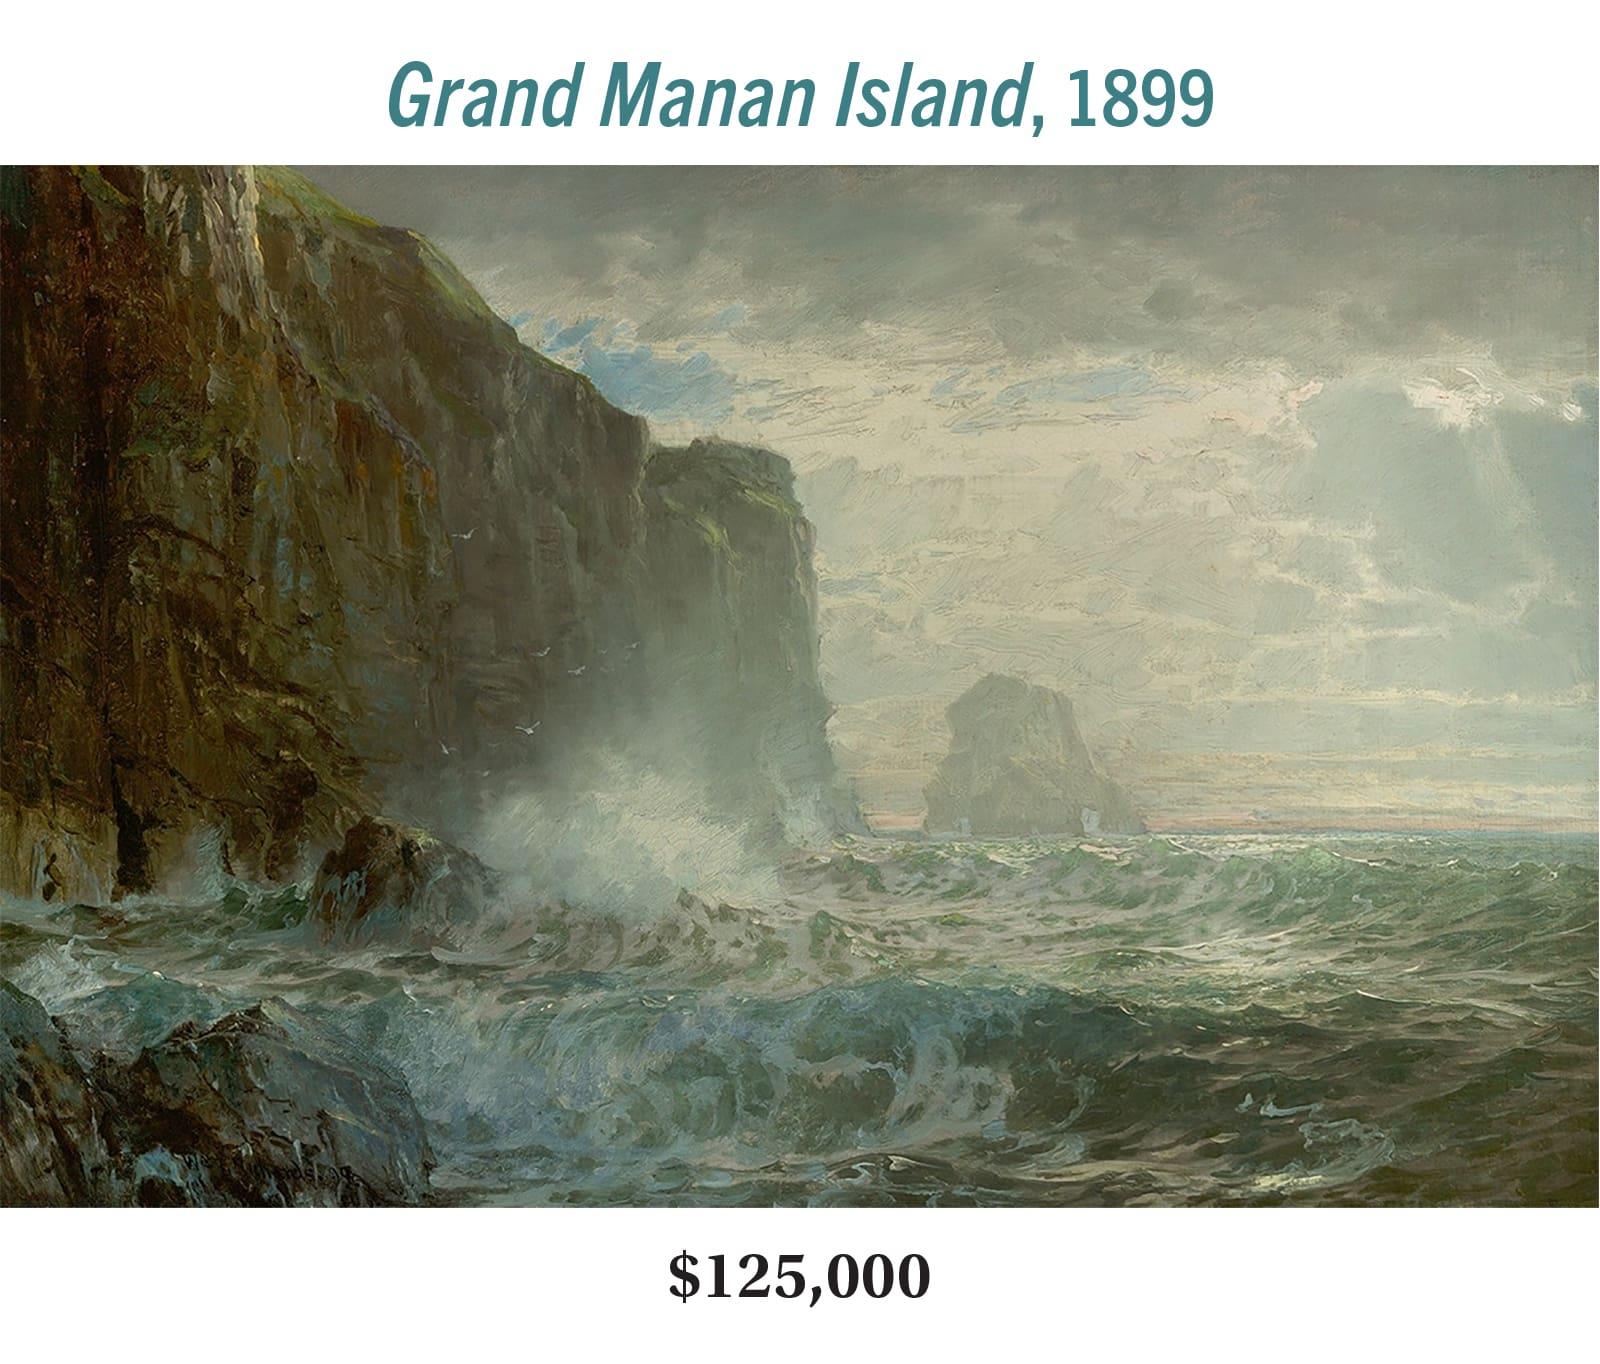 William Trost Richards (1833–1905), Grand Manan Island, 1899, oil on canvas, Hudson River School seascape painting